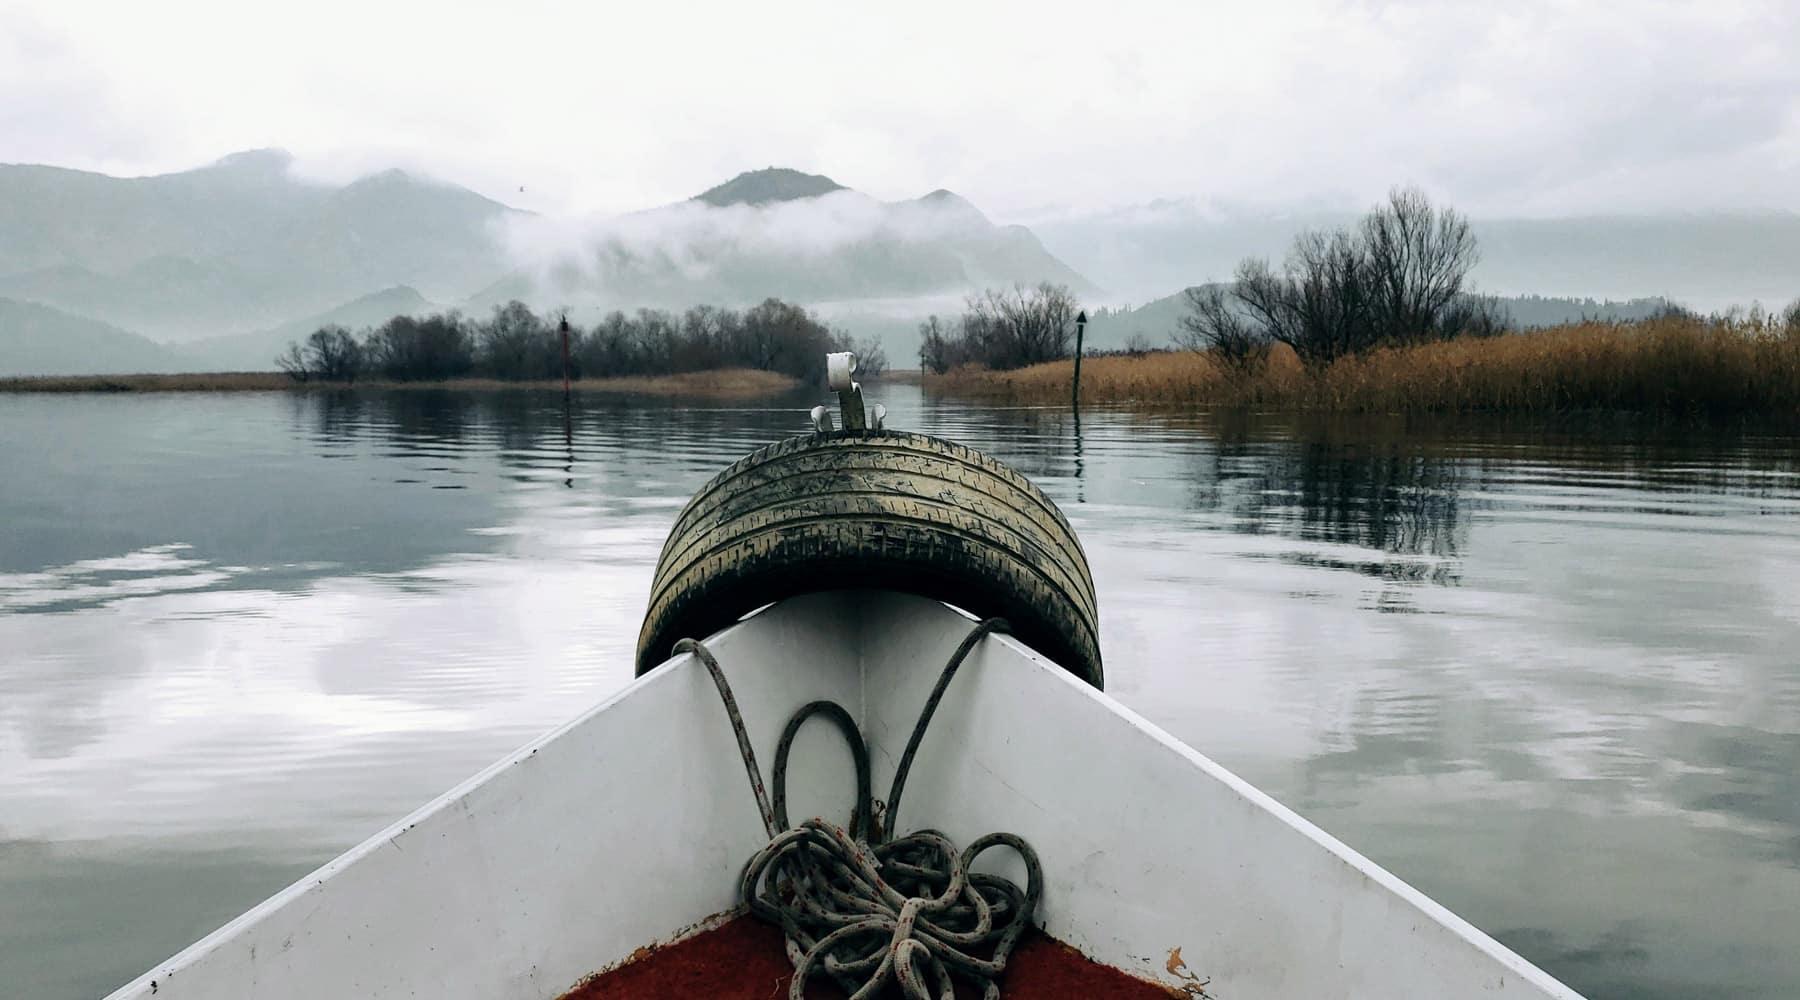 Shkodra Lake, Montenegro – The Largest in Southern Europe